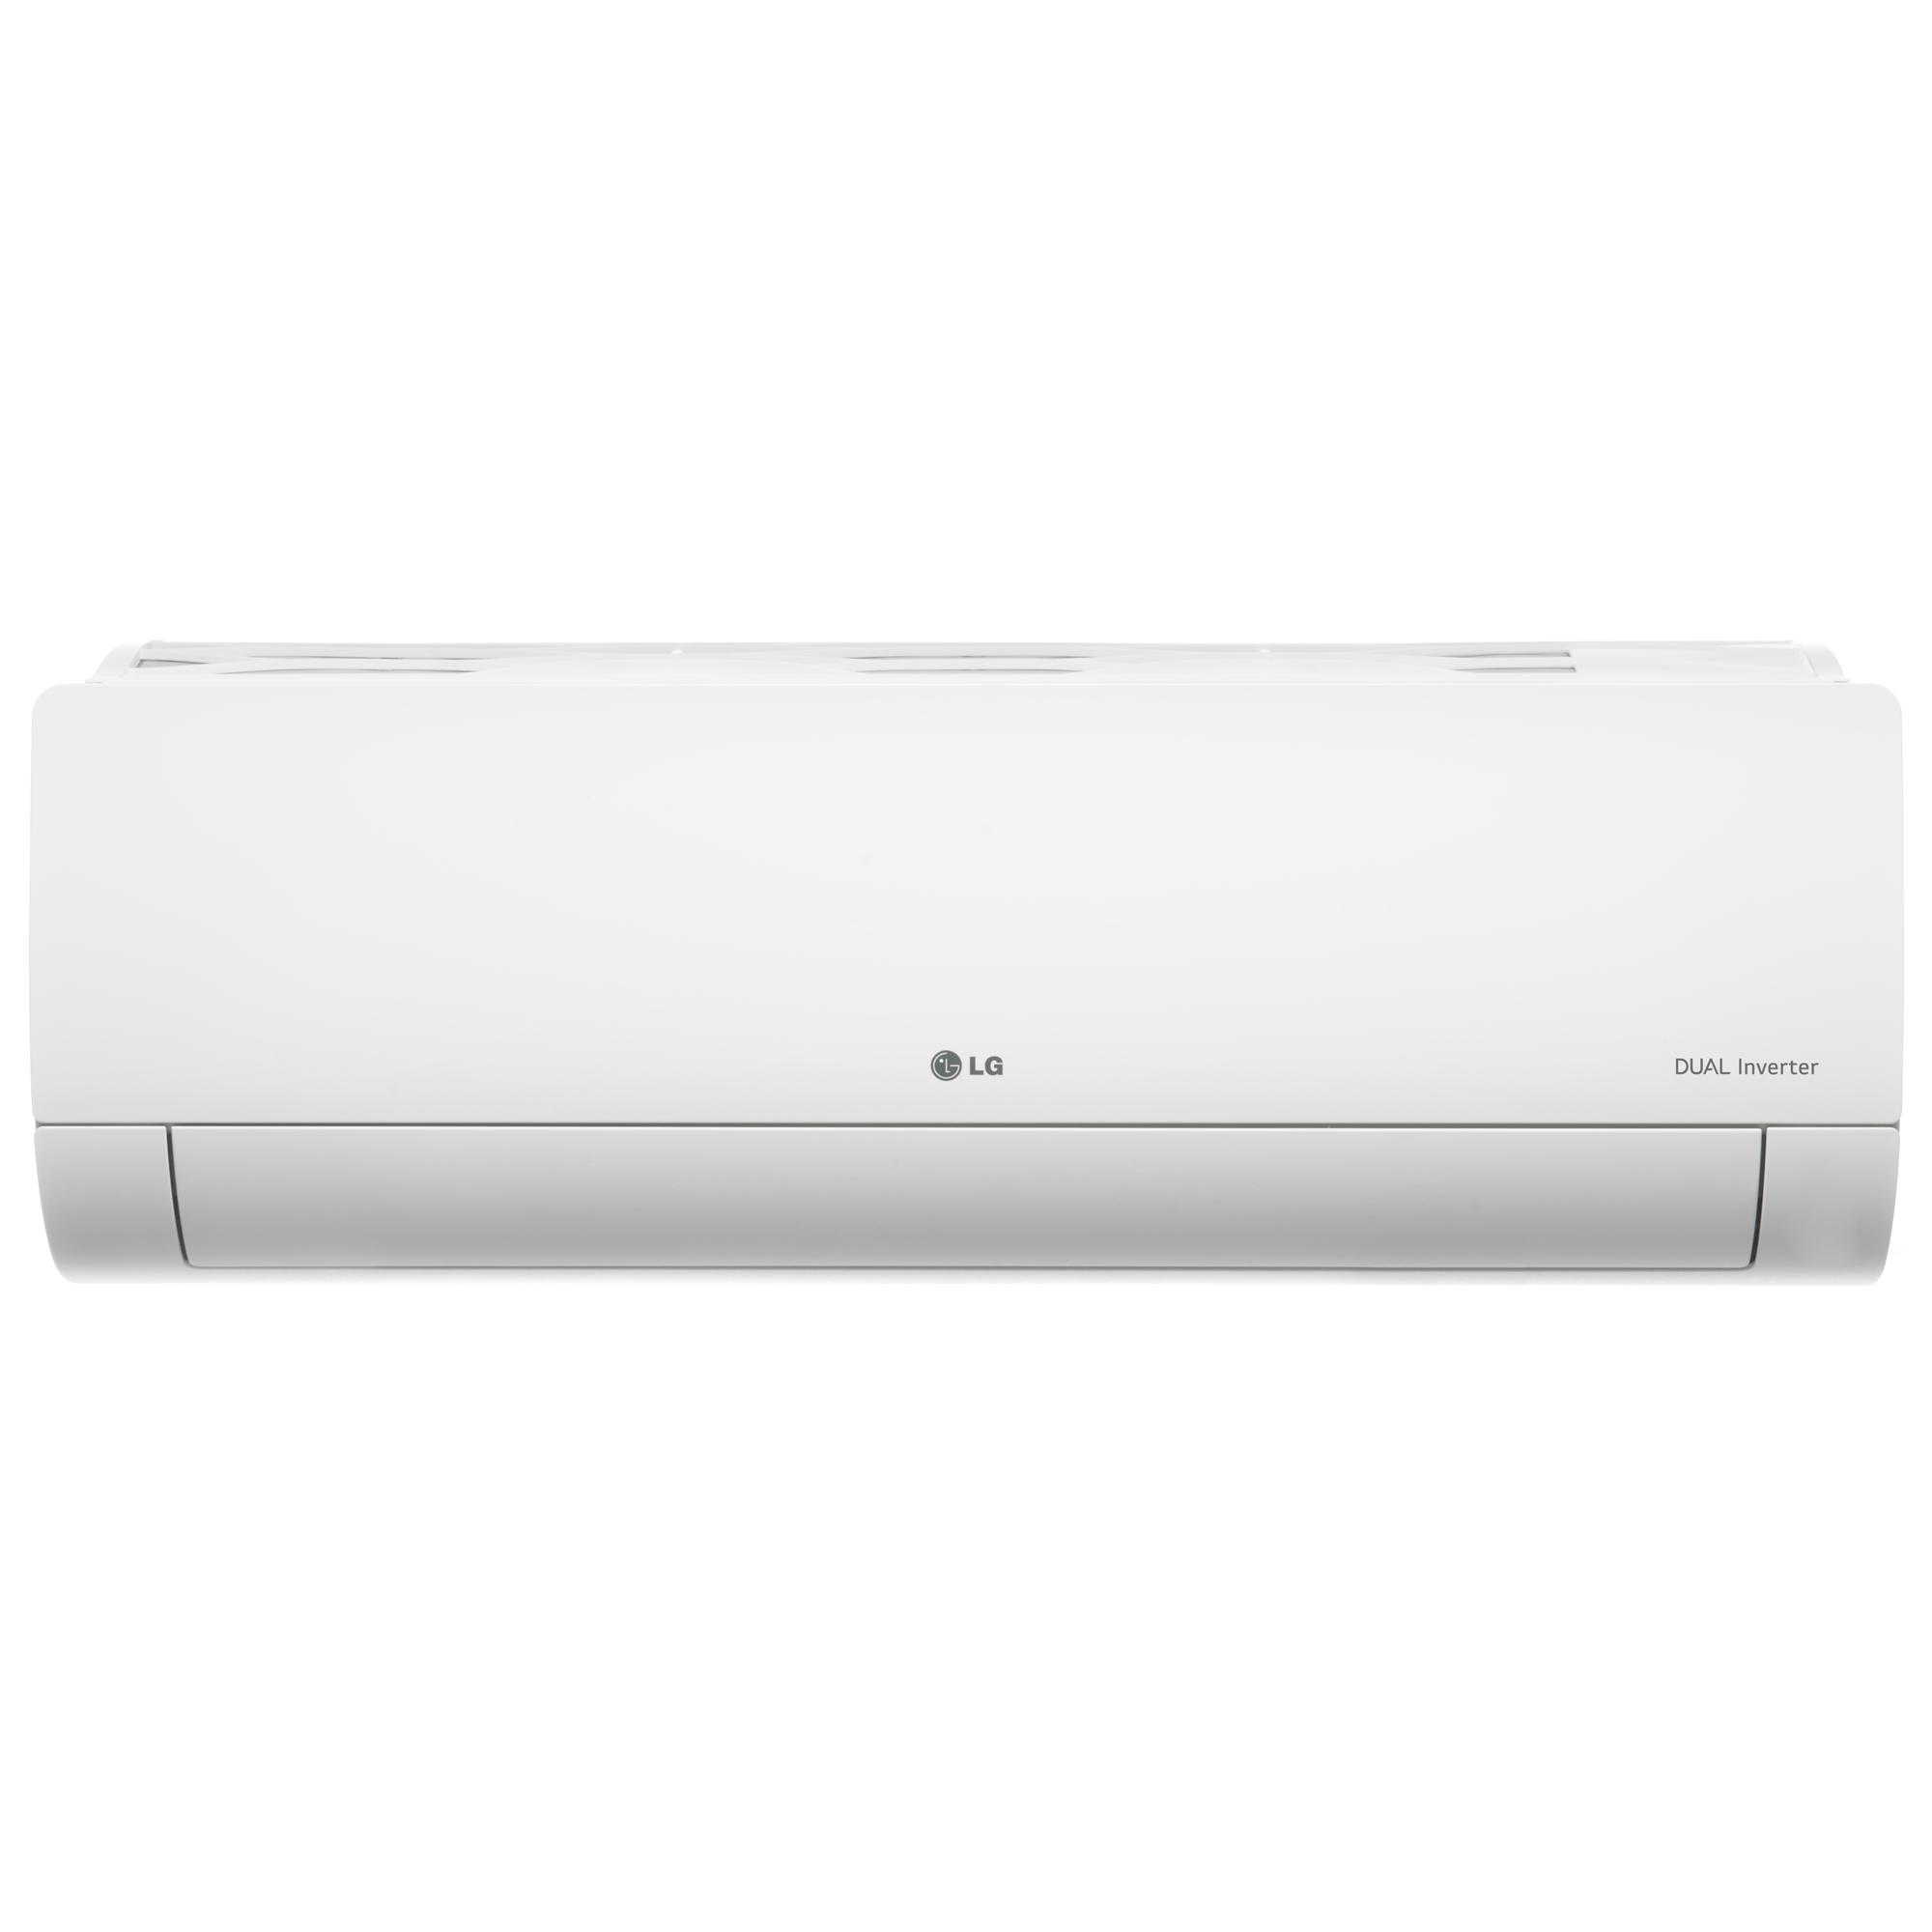 LG 1 Ton 3 Star Inverter Split AC (Air Purification Filter, Copper Condenser, MS-Q12UVXA, White)_1